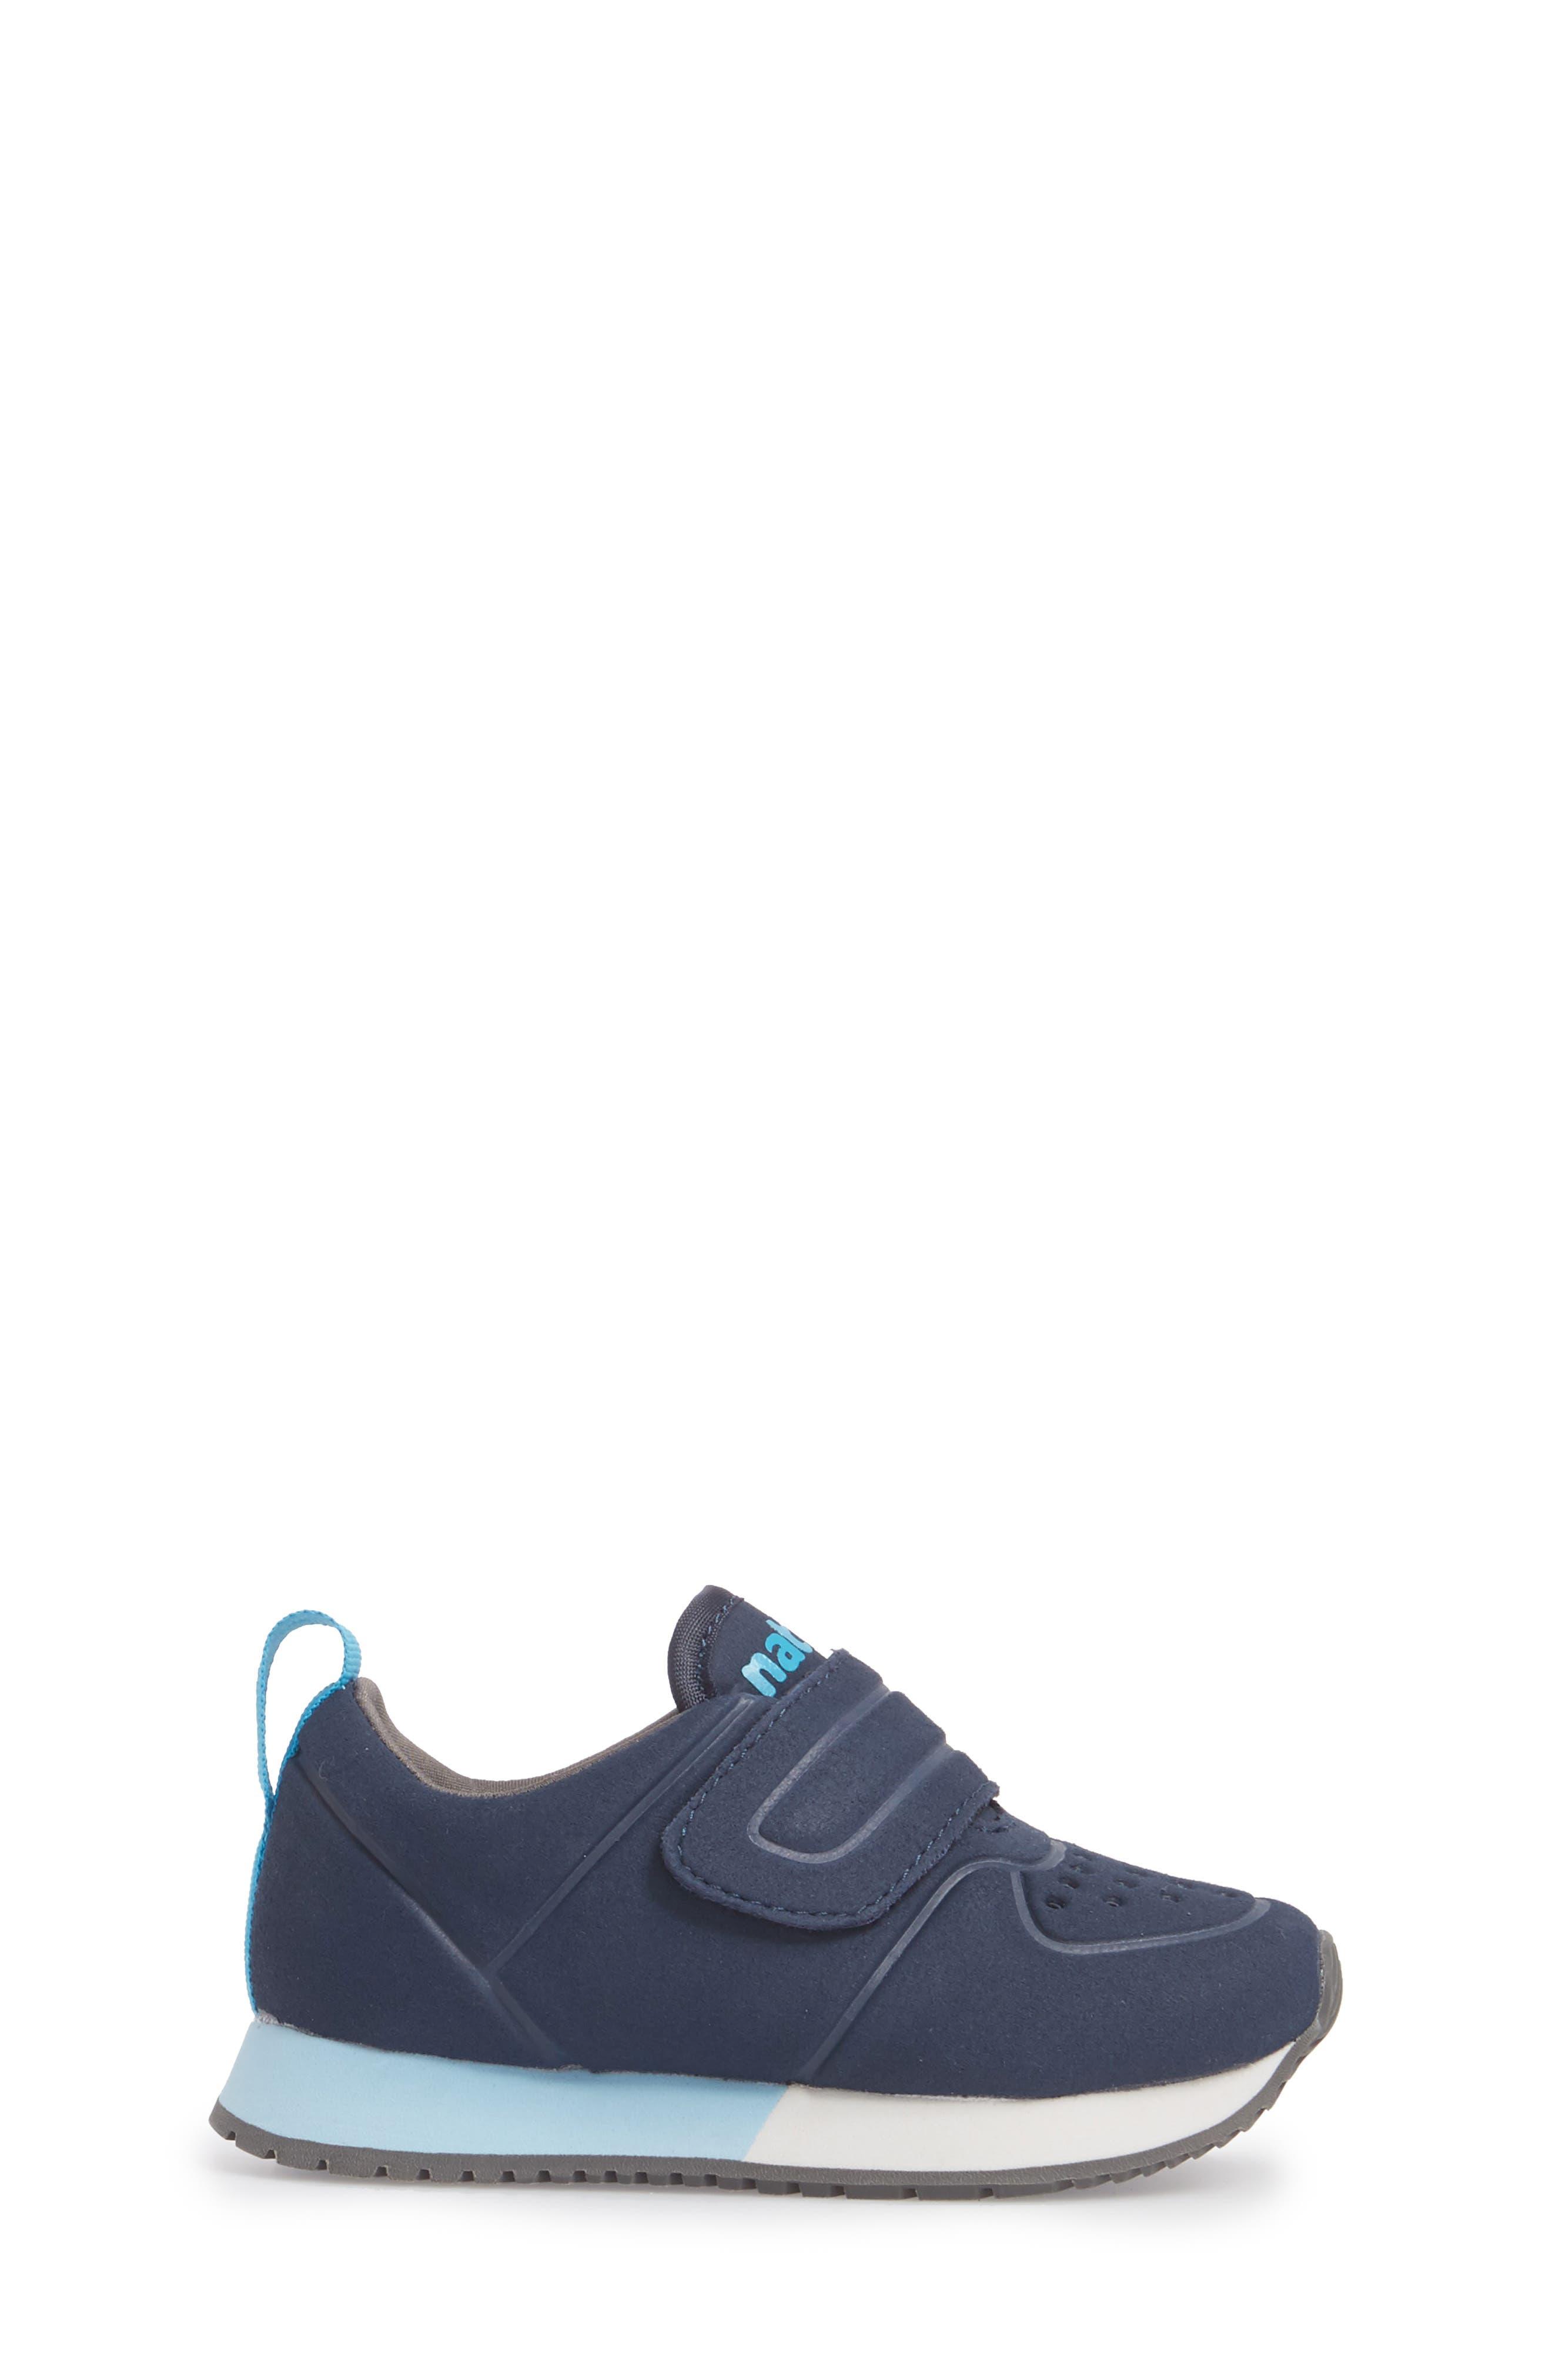 Native Cornell Perforated Sneaker,                             Alternate thumbnail 3, color,                             REGATTA BLUE/ SHELL WHITE